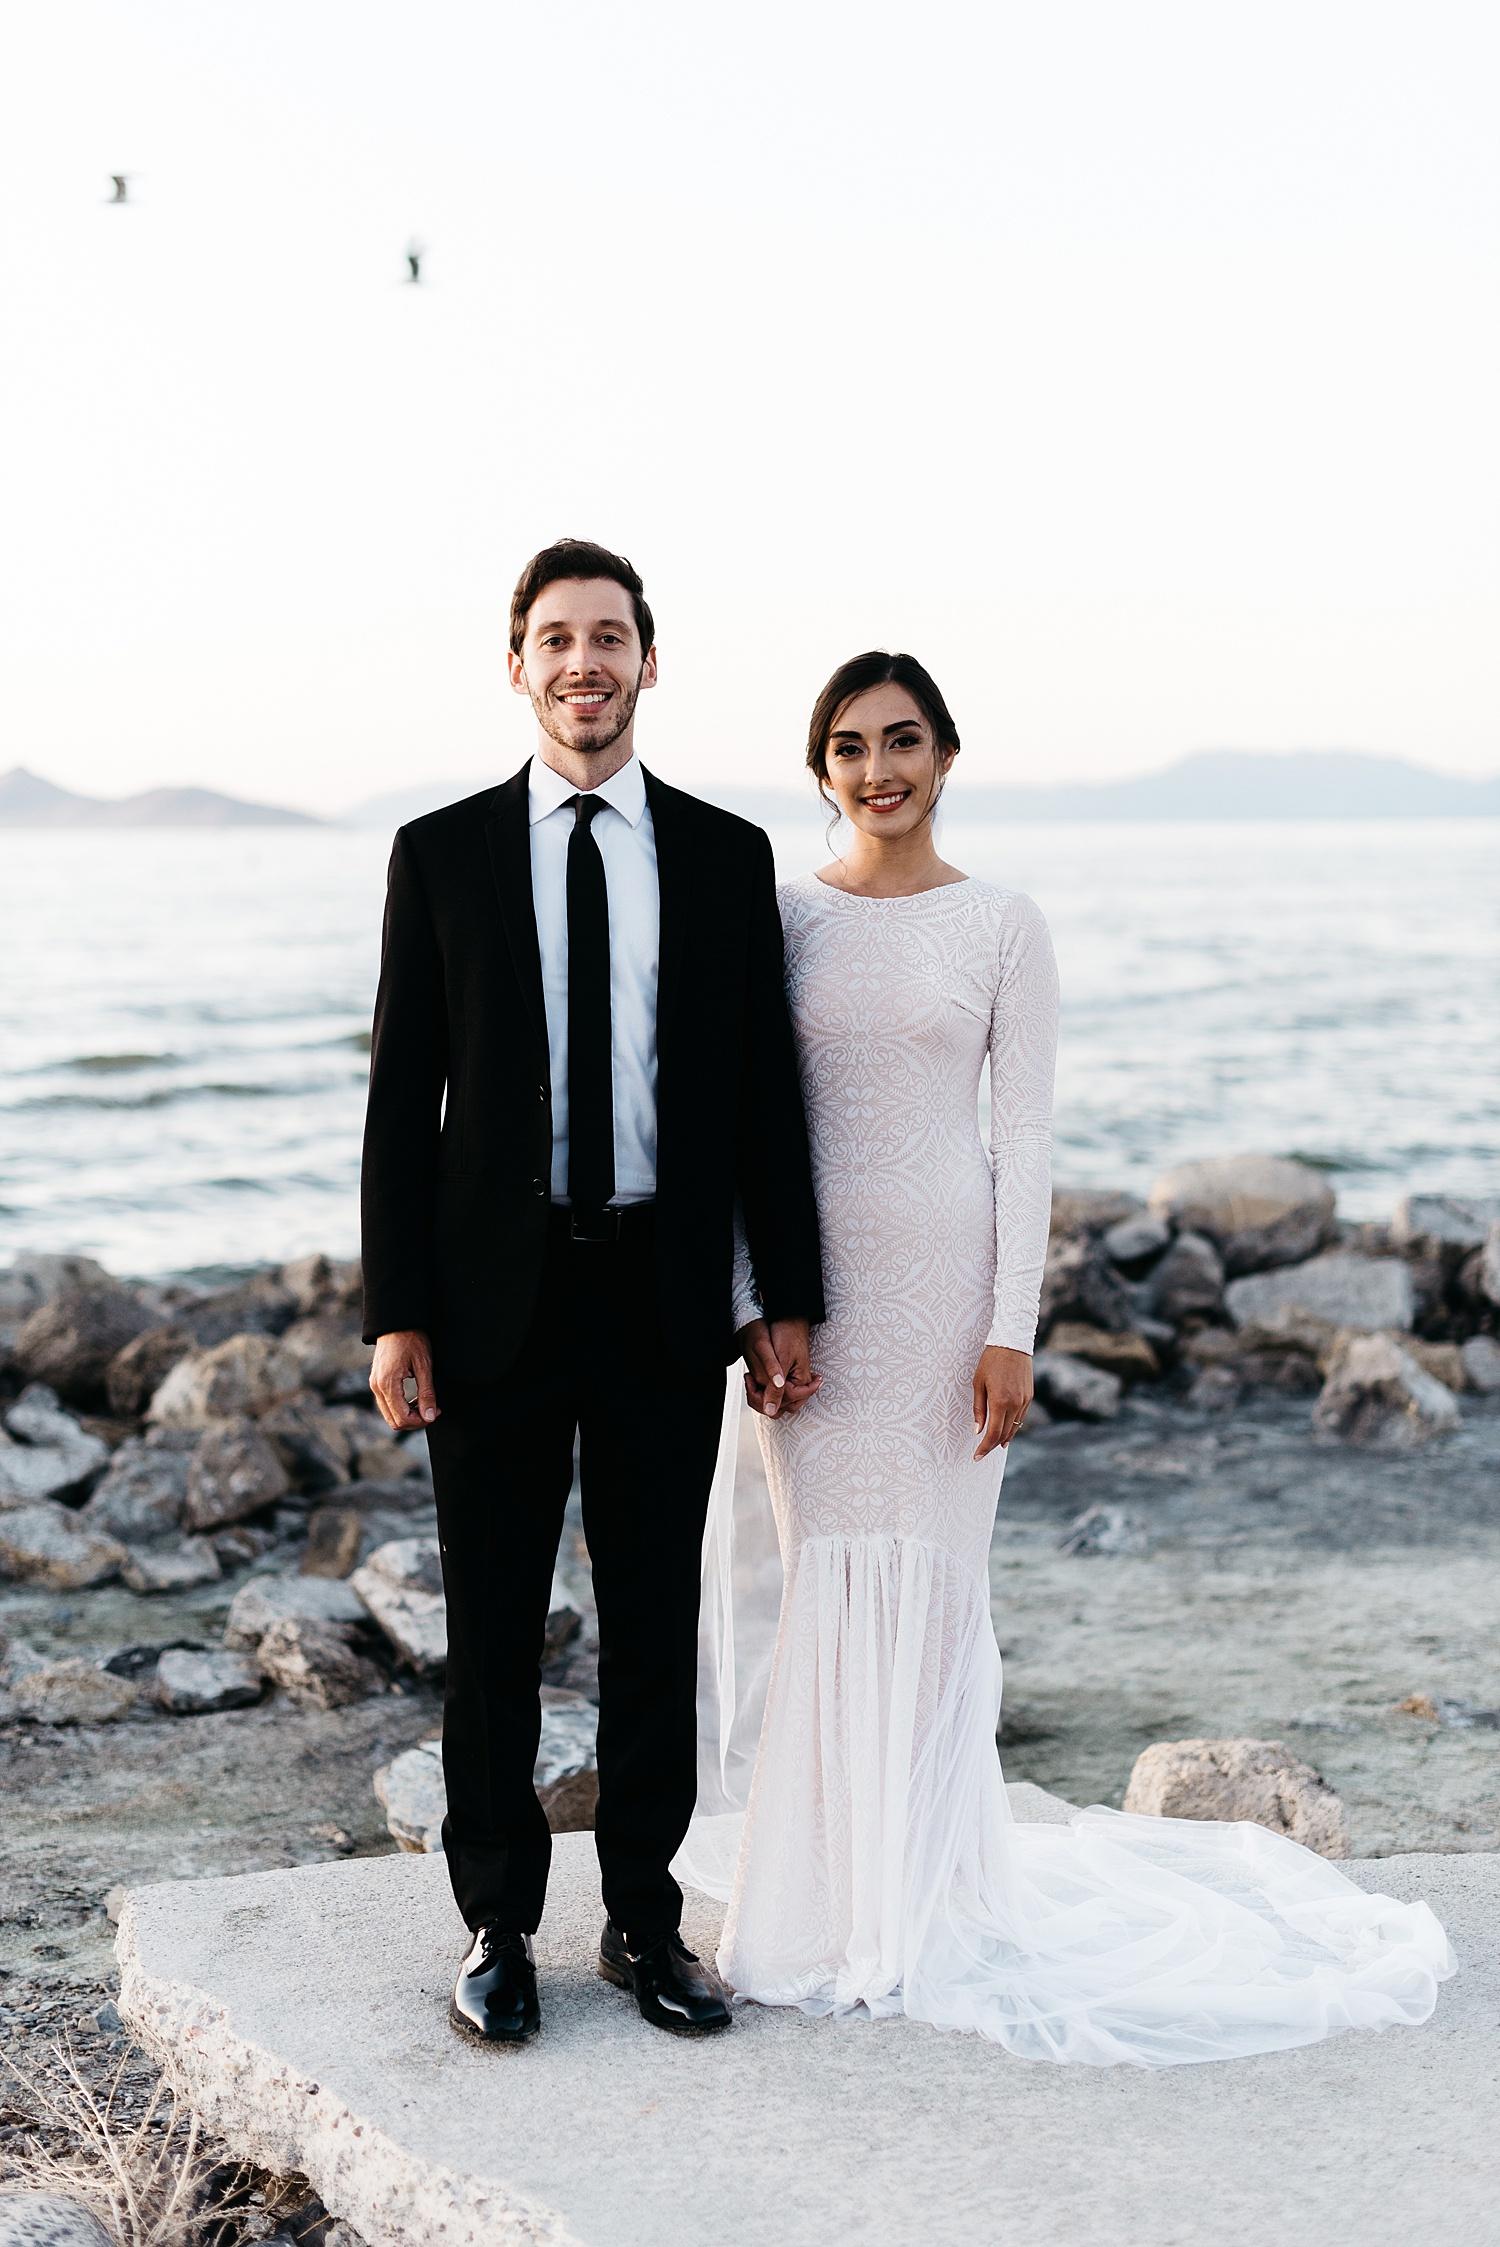 Zandra Barriga Photo - Cassie and Tristan Great Salt Lake Bridas_0018.jpg